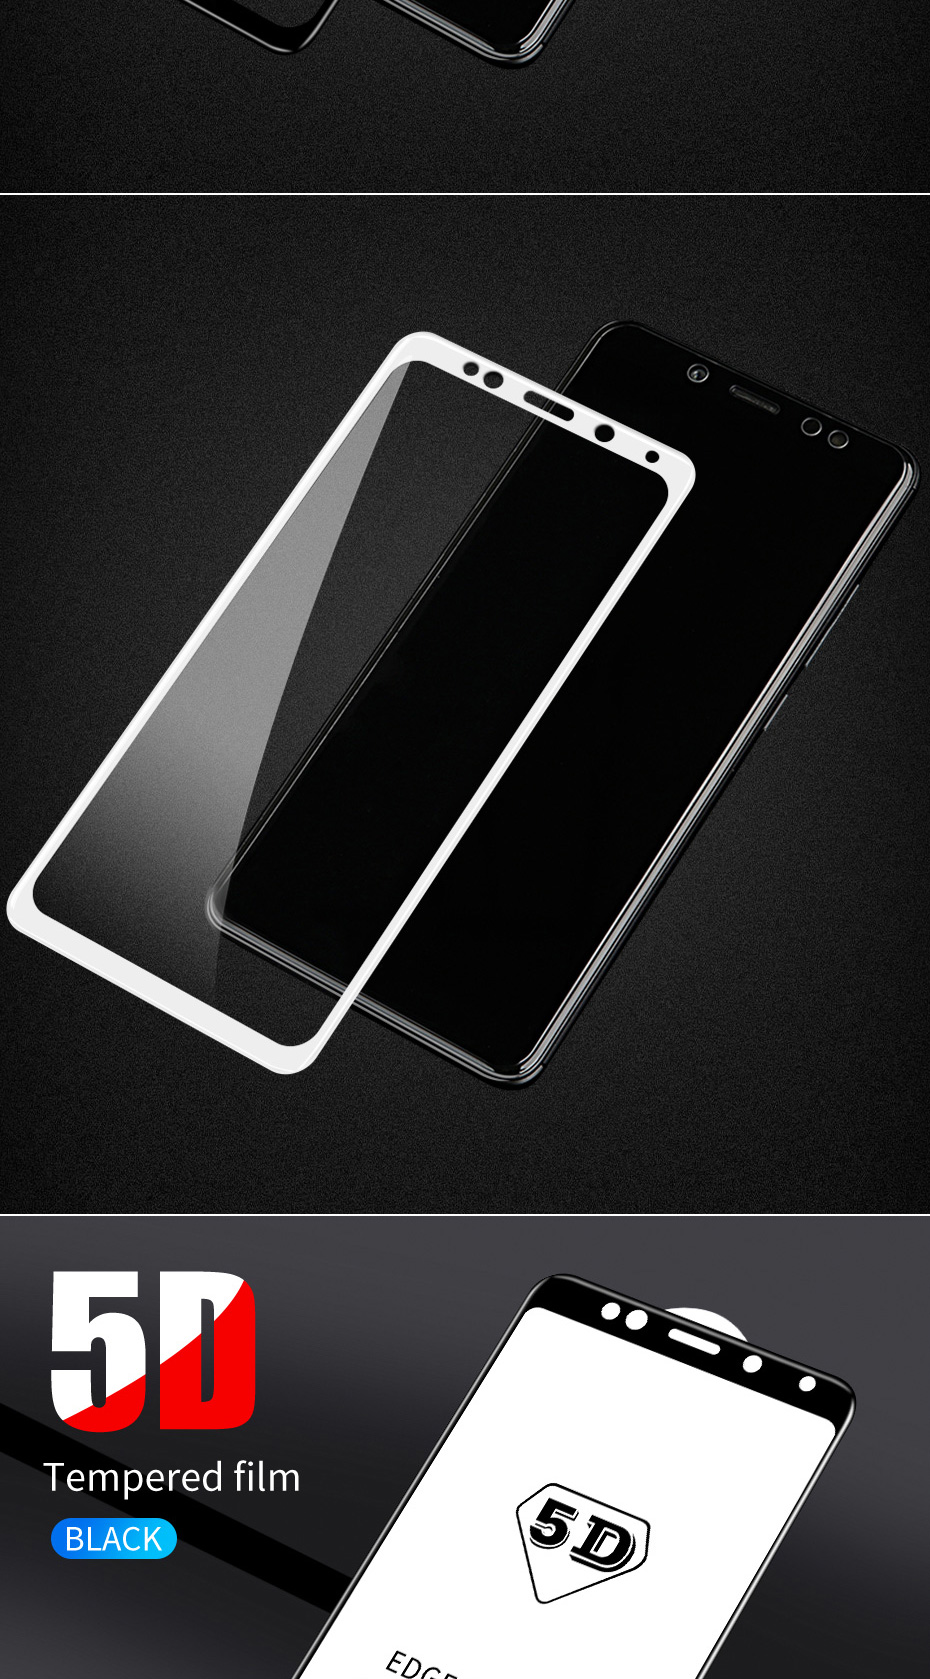 ZNP 5D Screen Protector Tempered Glass For Xiaomi Redmi Note 7 5 Pro Redmi 4X 7A 7 6 Protective Glass For Redmi 5 Plus k20 Film 10